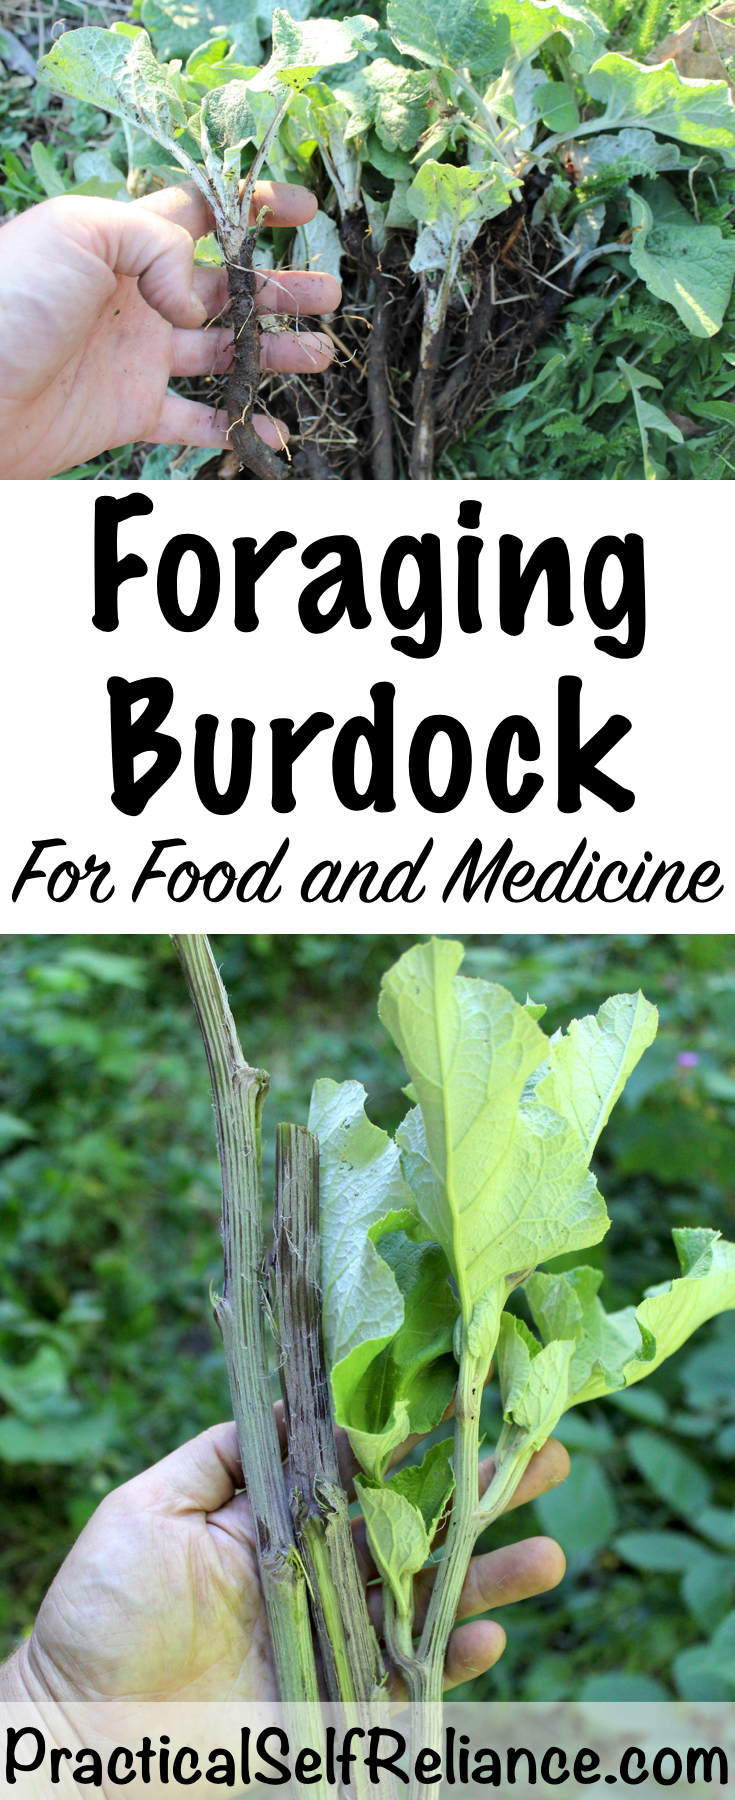 Foraging Burdock for Food and Medicine #foraging #foragedfood #wildcrafting #wildfood #burdock